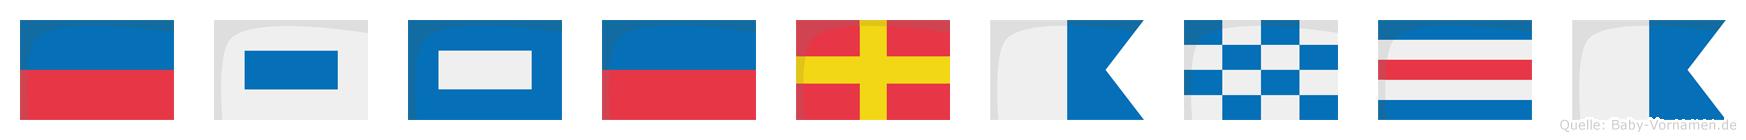 Esperanca im Flaggenalphabet